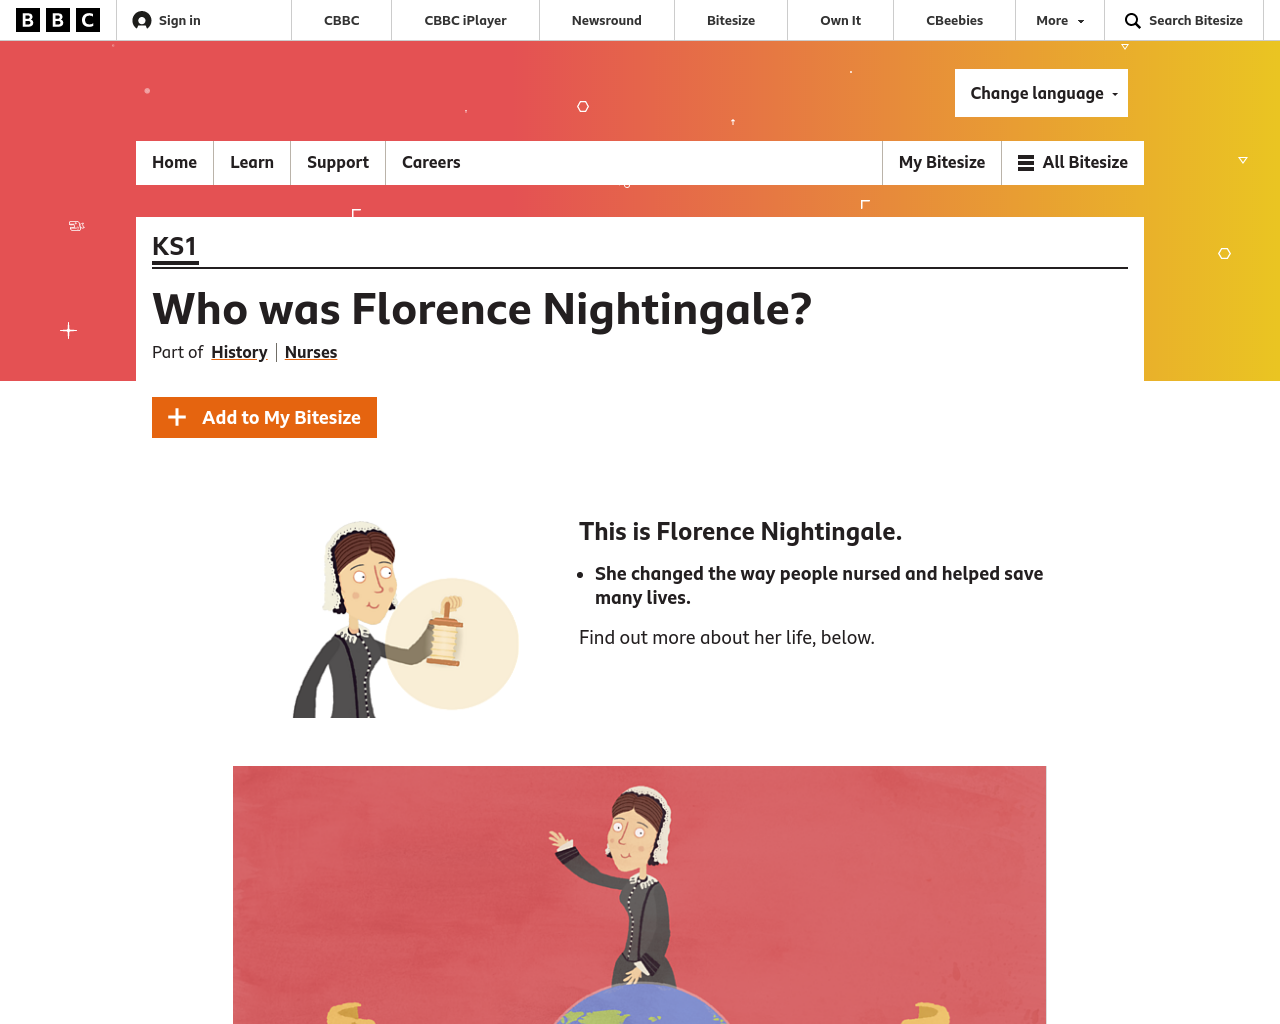 Who Was Florence Nightingale?